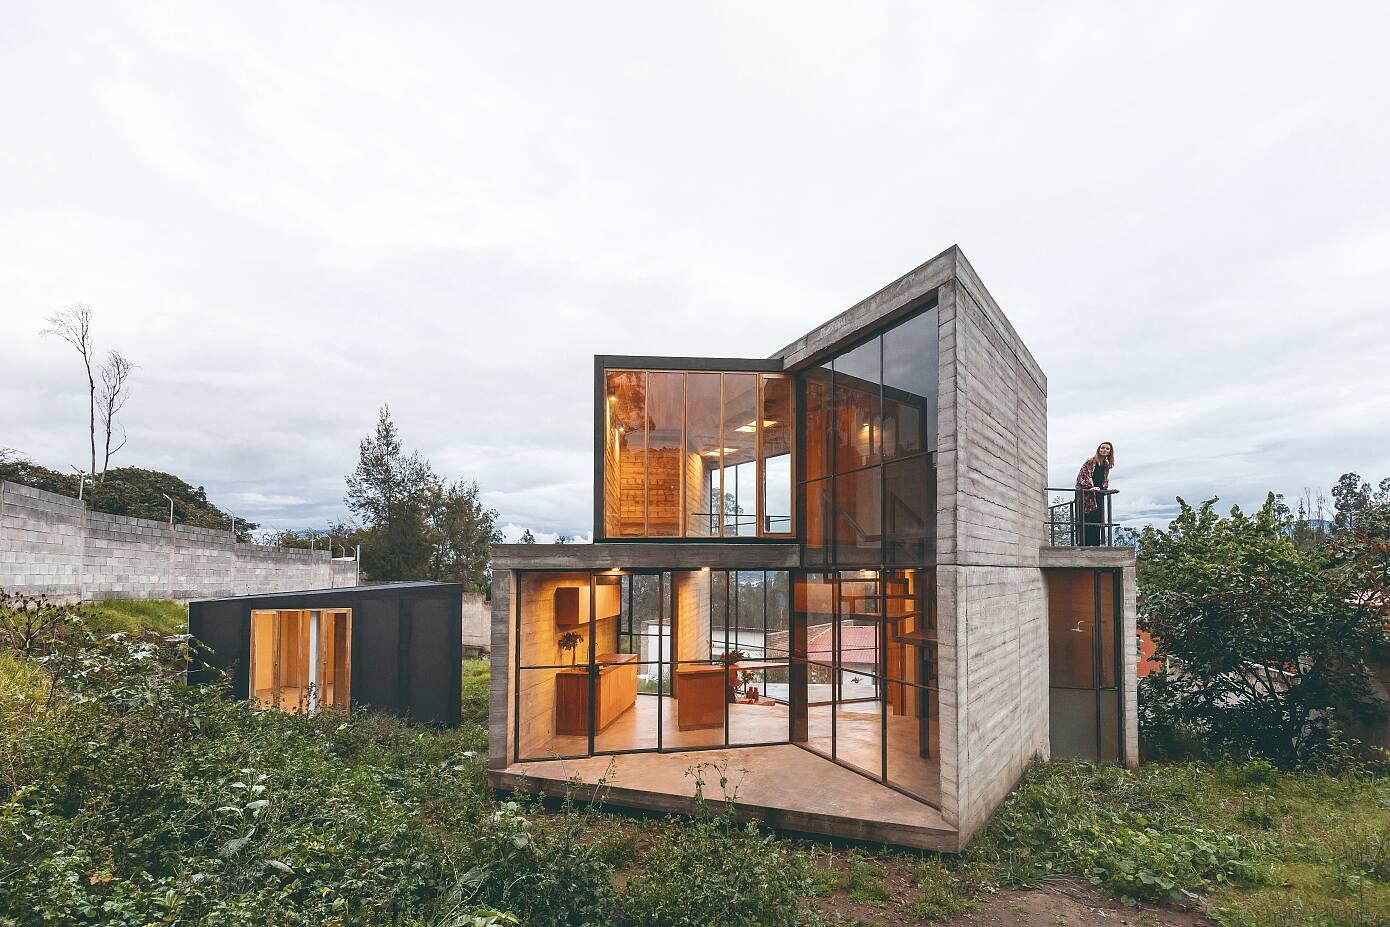 Muta House by Emilio Lopez